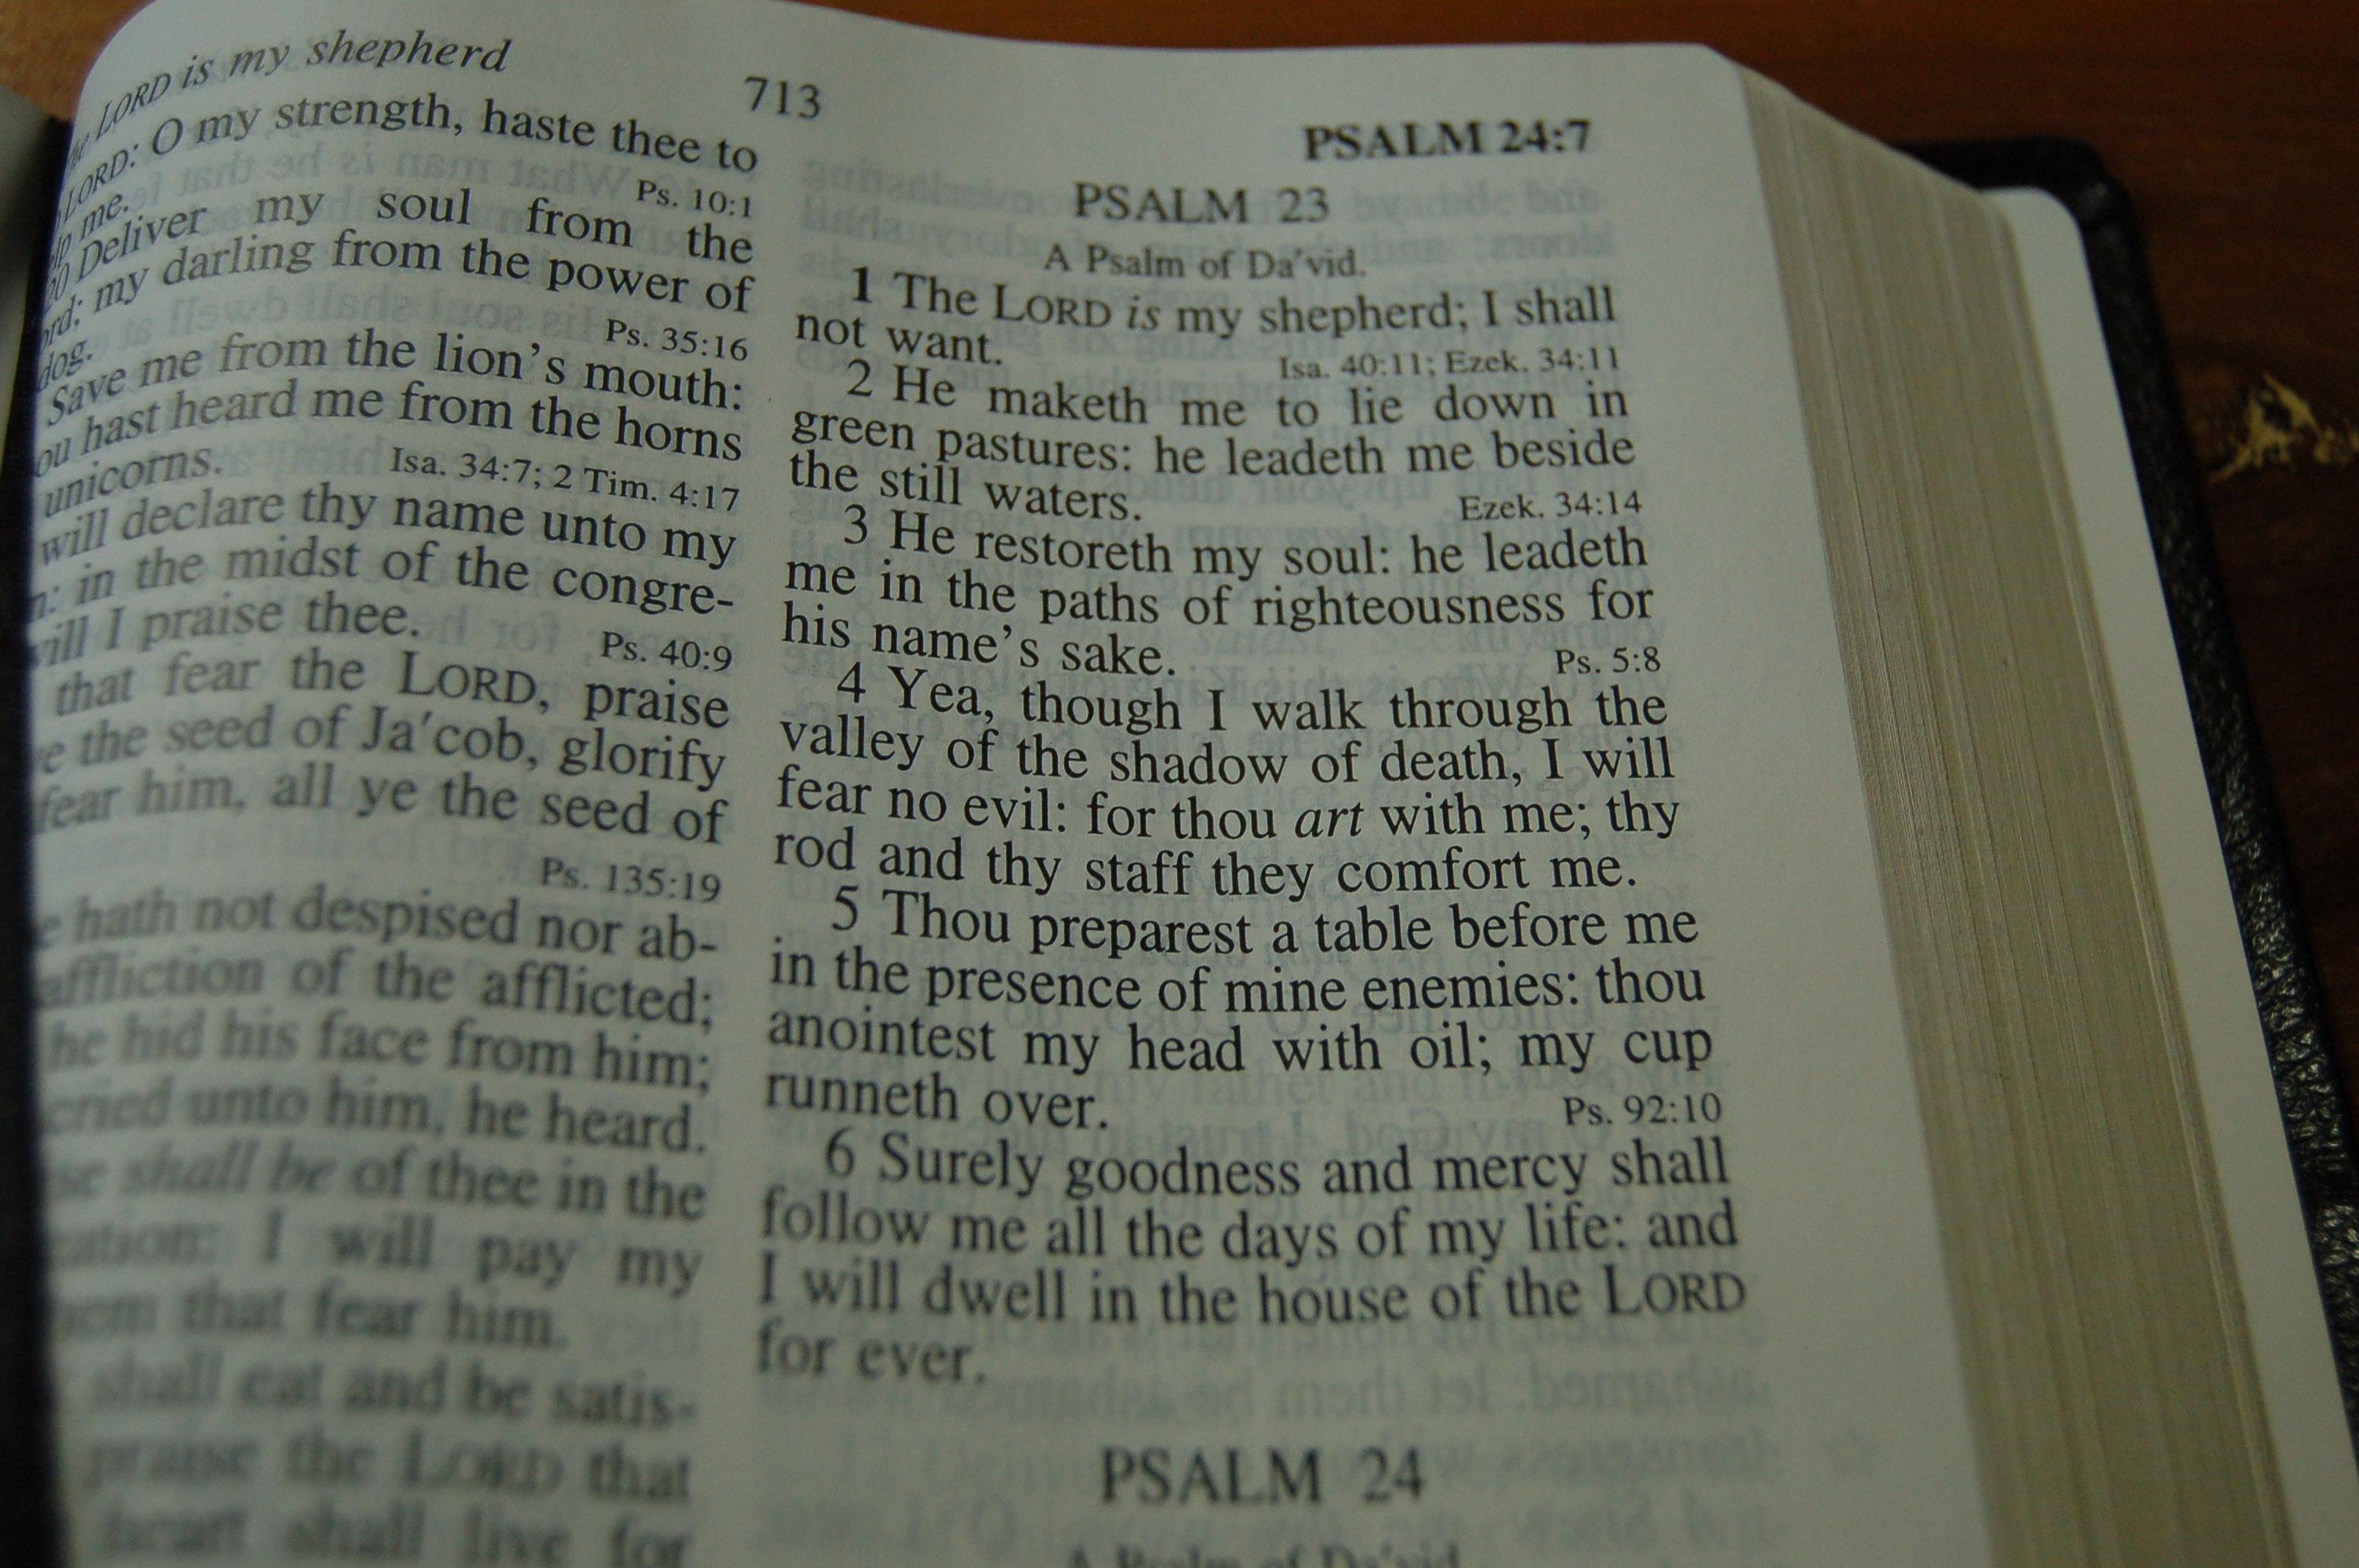 Christian Stock Photos by Linda Bateman - Bible Open to Psalm 23